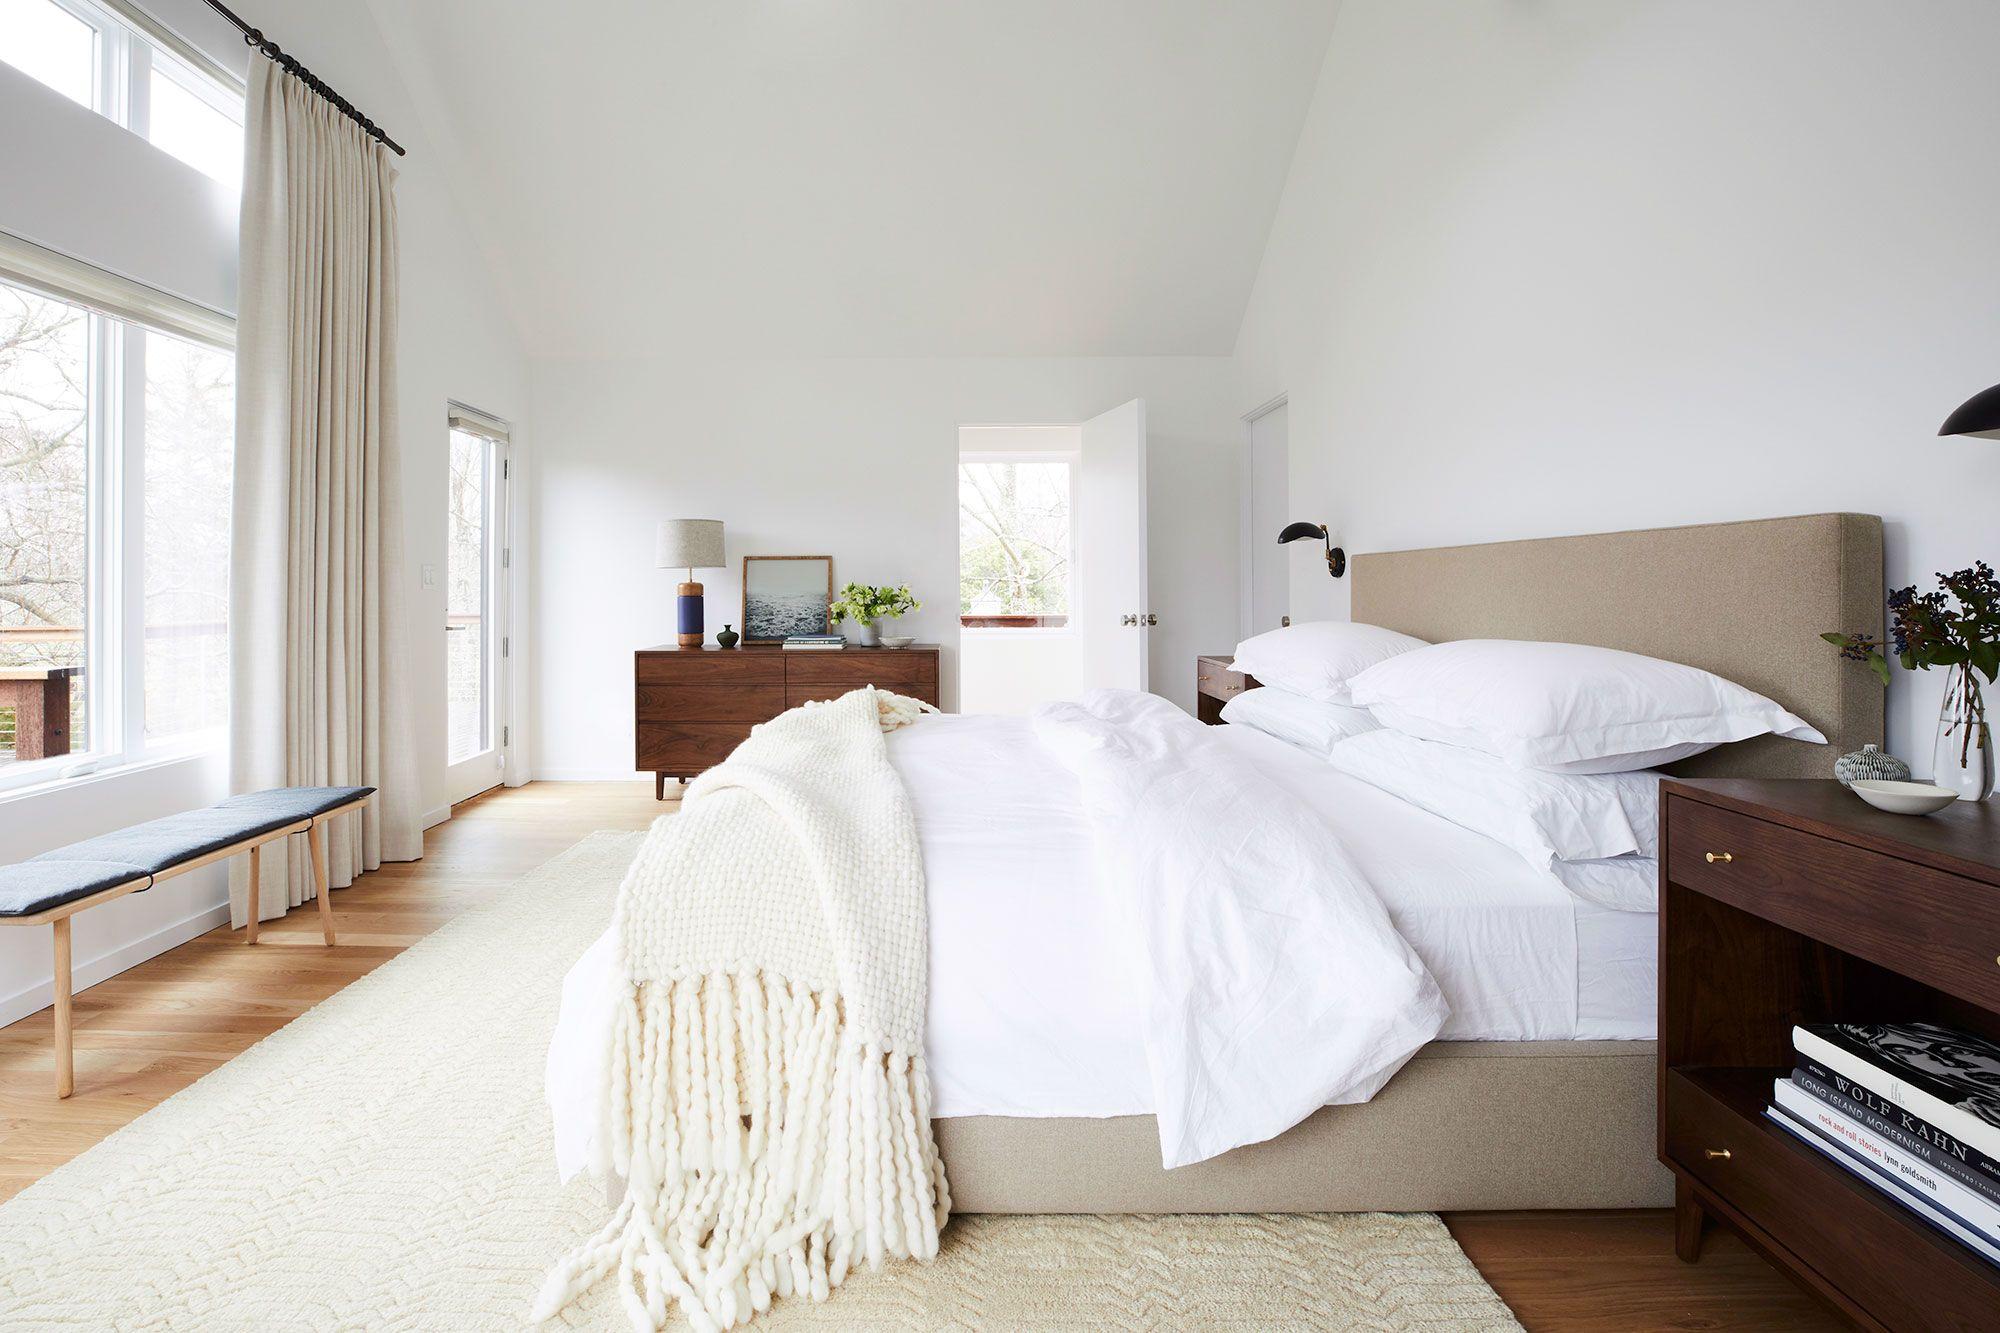 20 Cozy Bedroom Ideas How